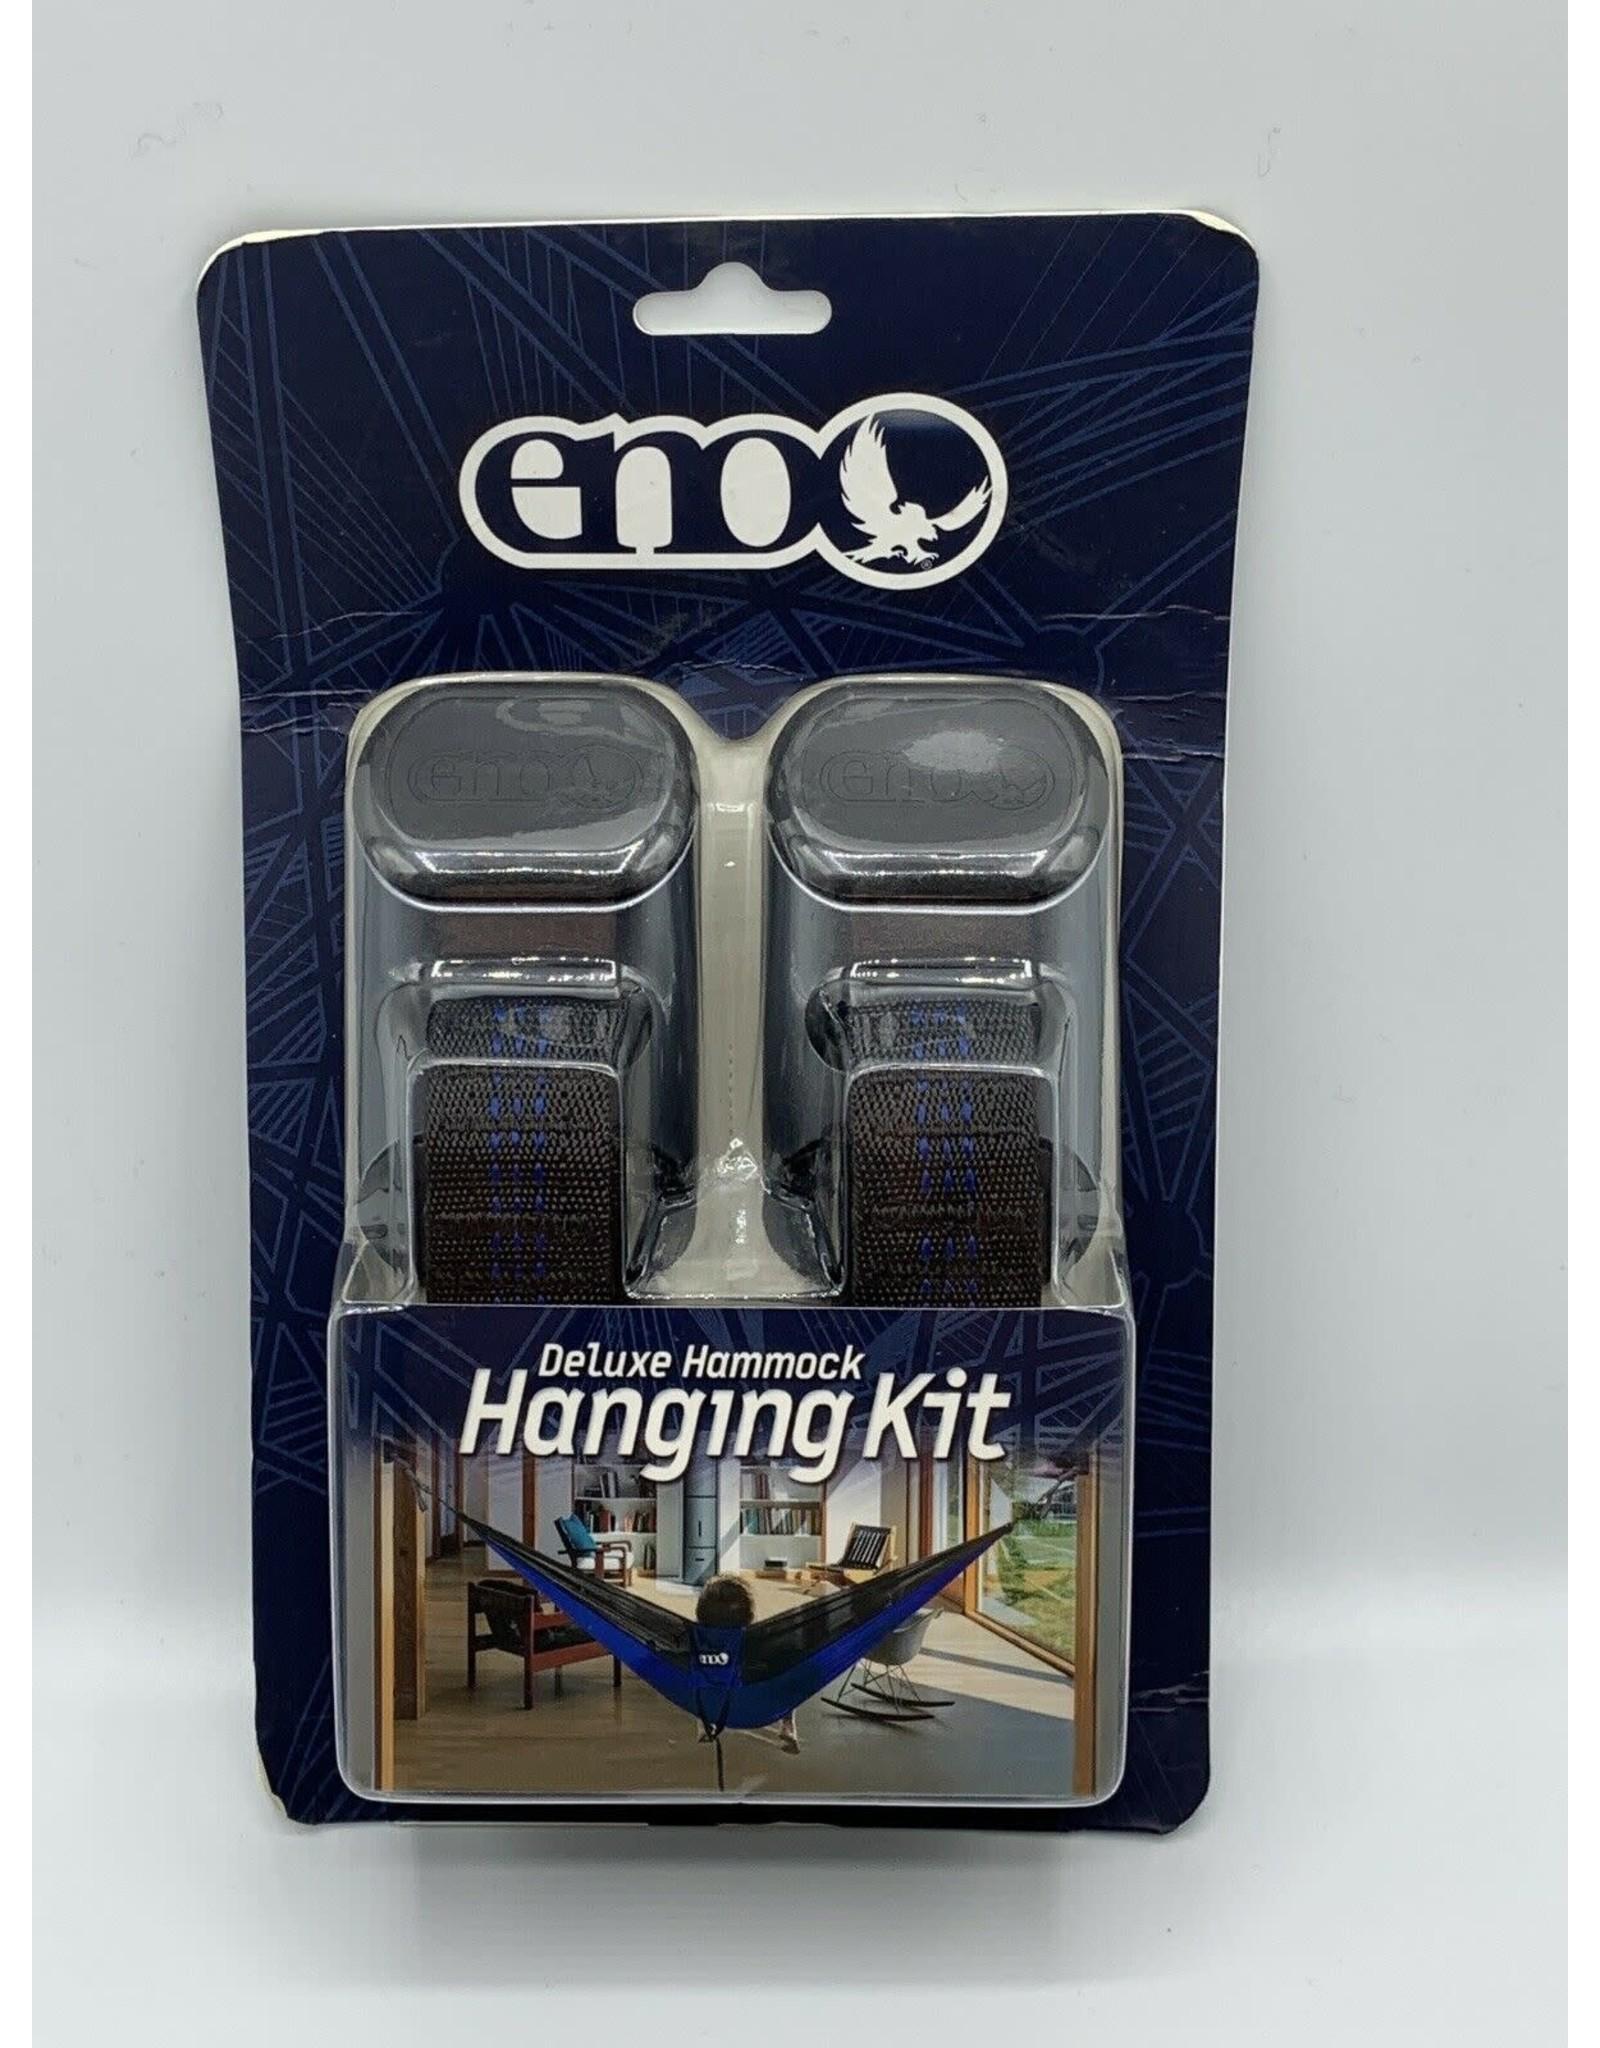 ENO Eno Deluxe Hammock Hanging Kit